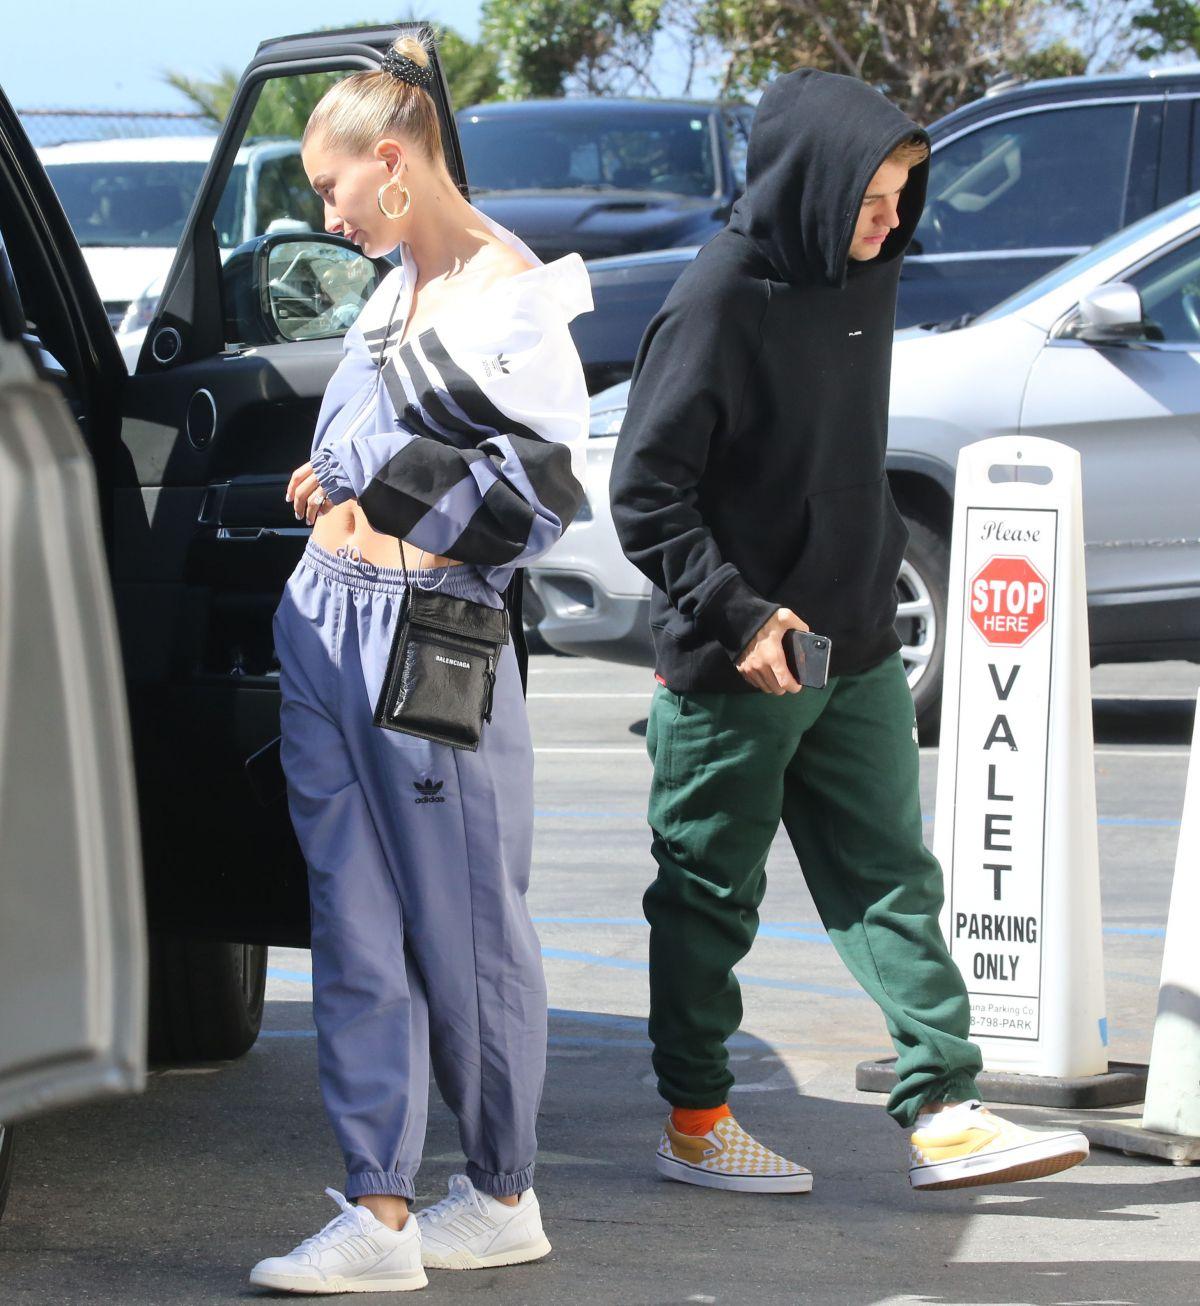 Hailey And Justin Bieber Out In Laguna Beach 03 30 2019